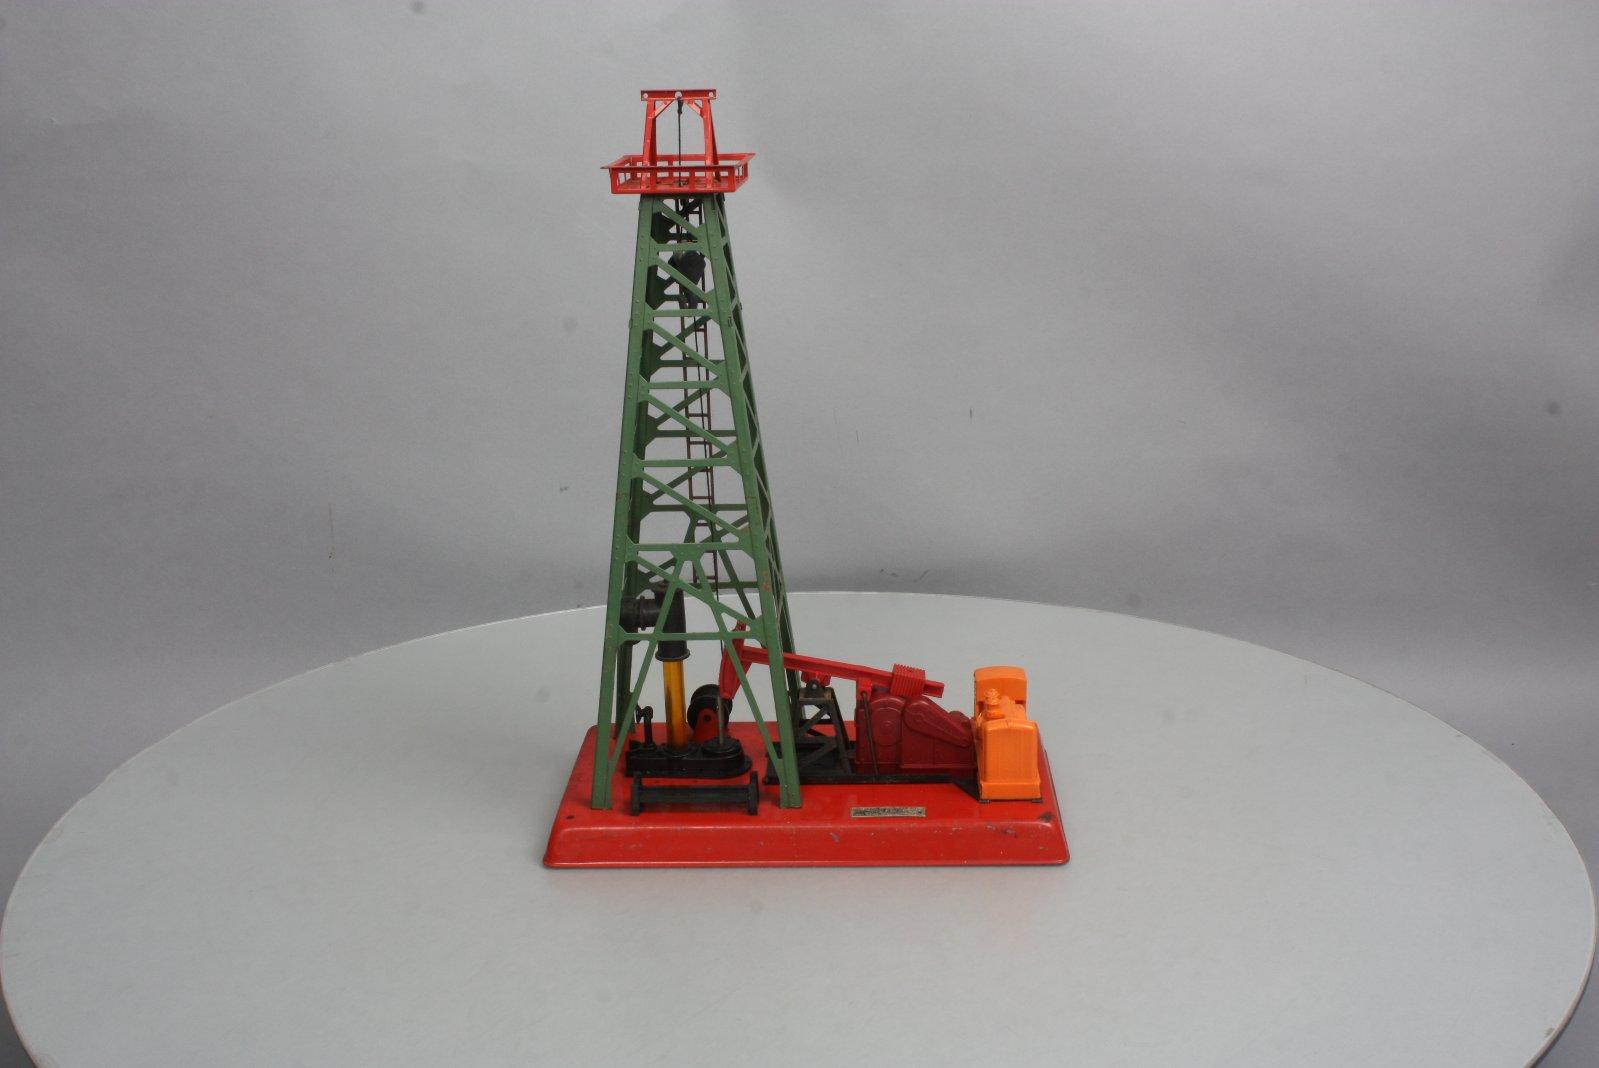 Lionel 455 Operating Oil Derrick w/Red Top | eBay